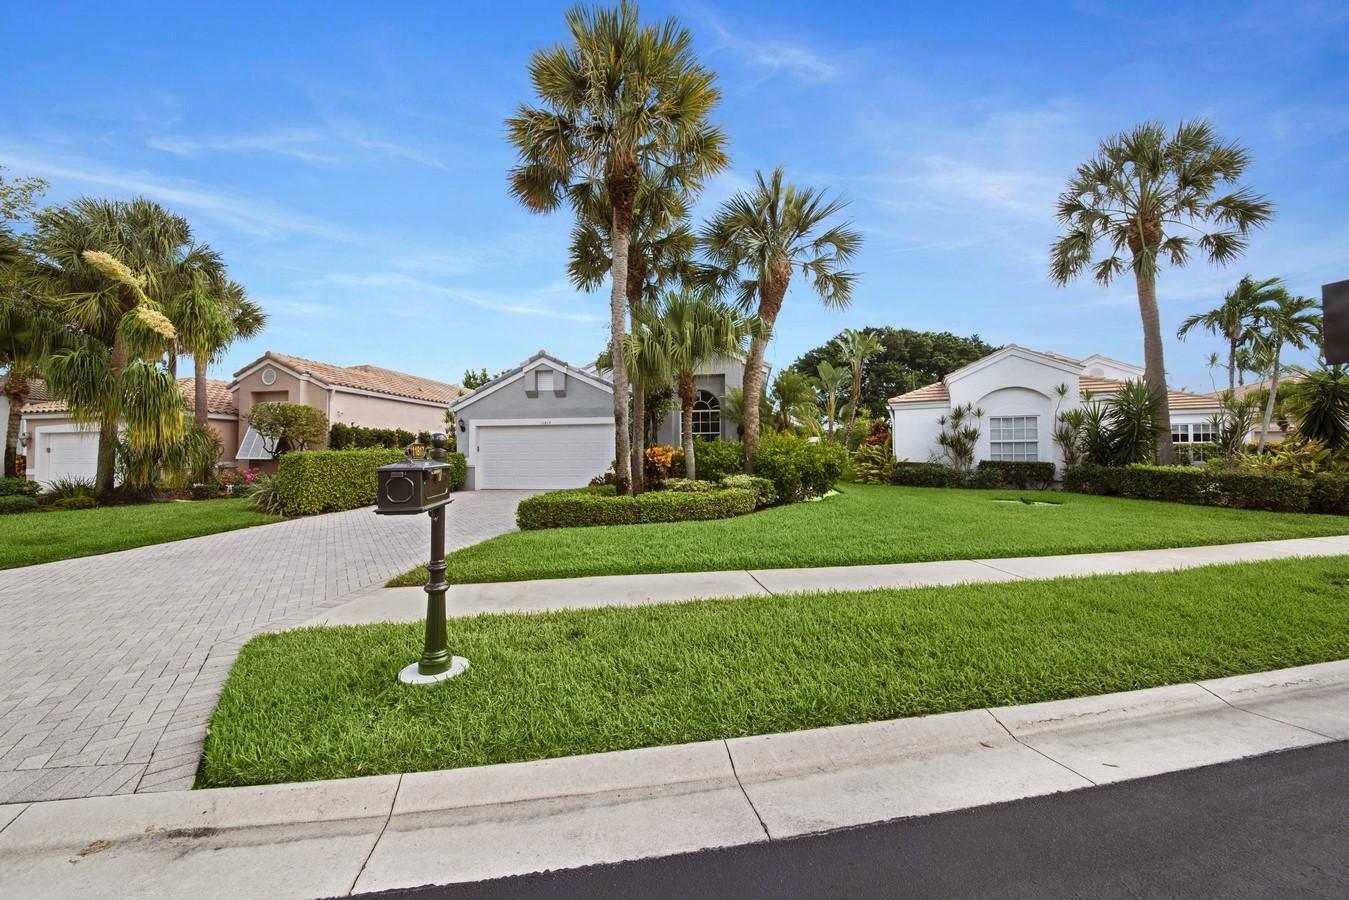 11817 Fountainside Circle Boynton Beach, FL 33437 photo 42